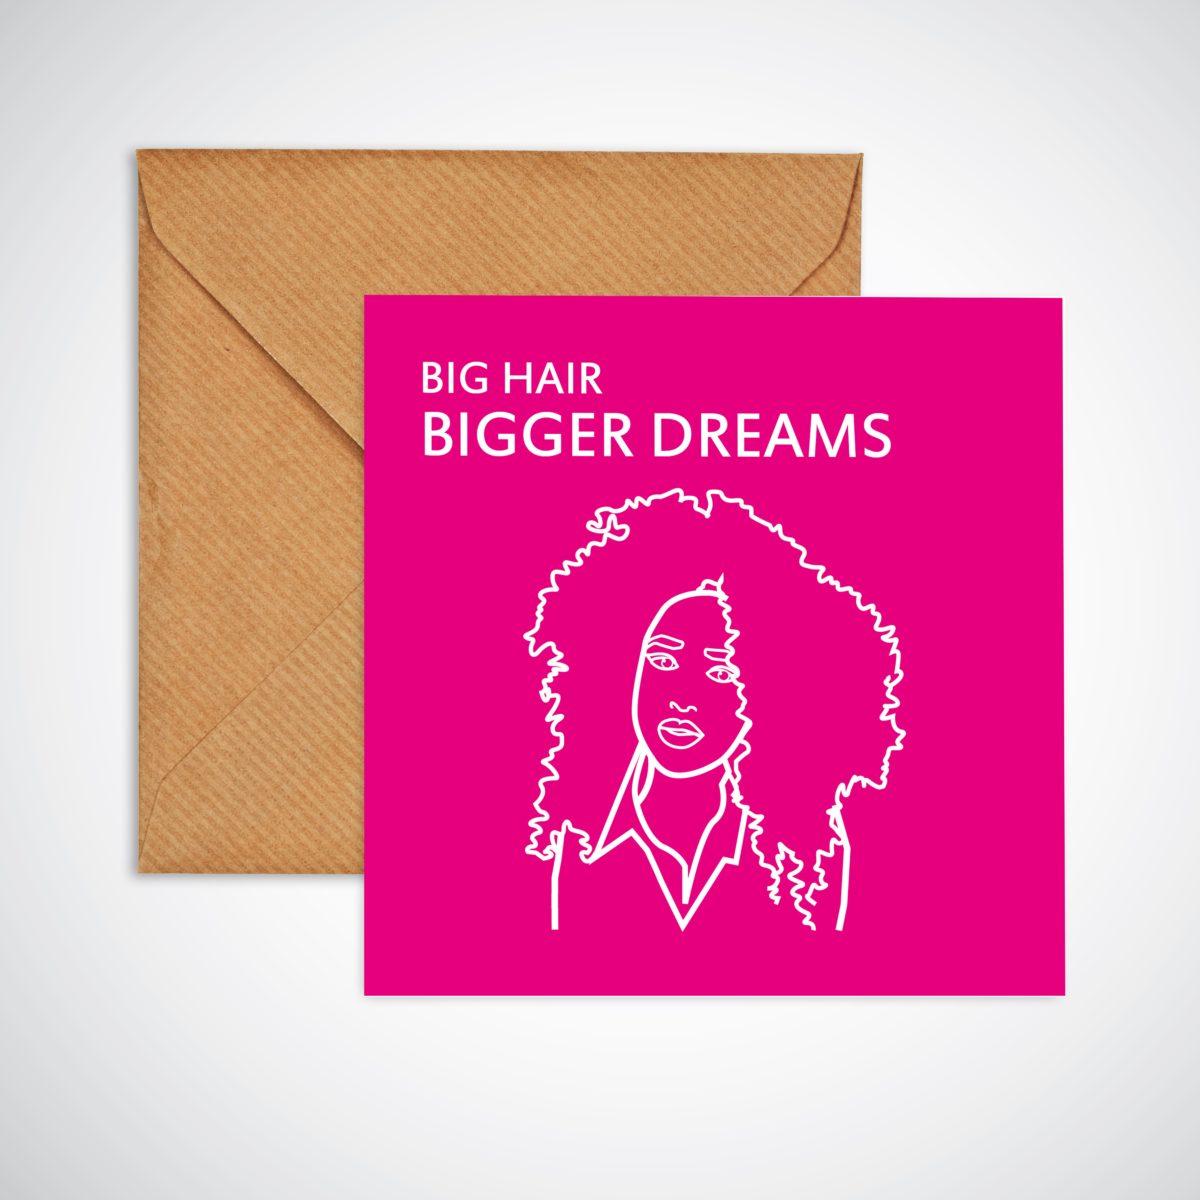 Big Hair Bigger Dreams